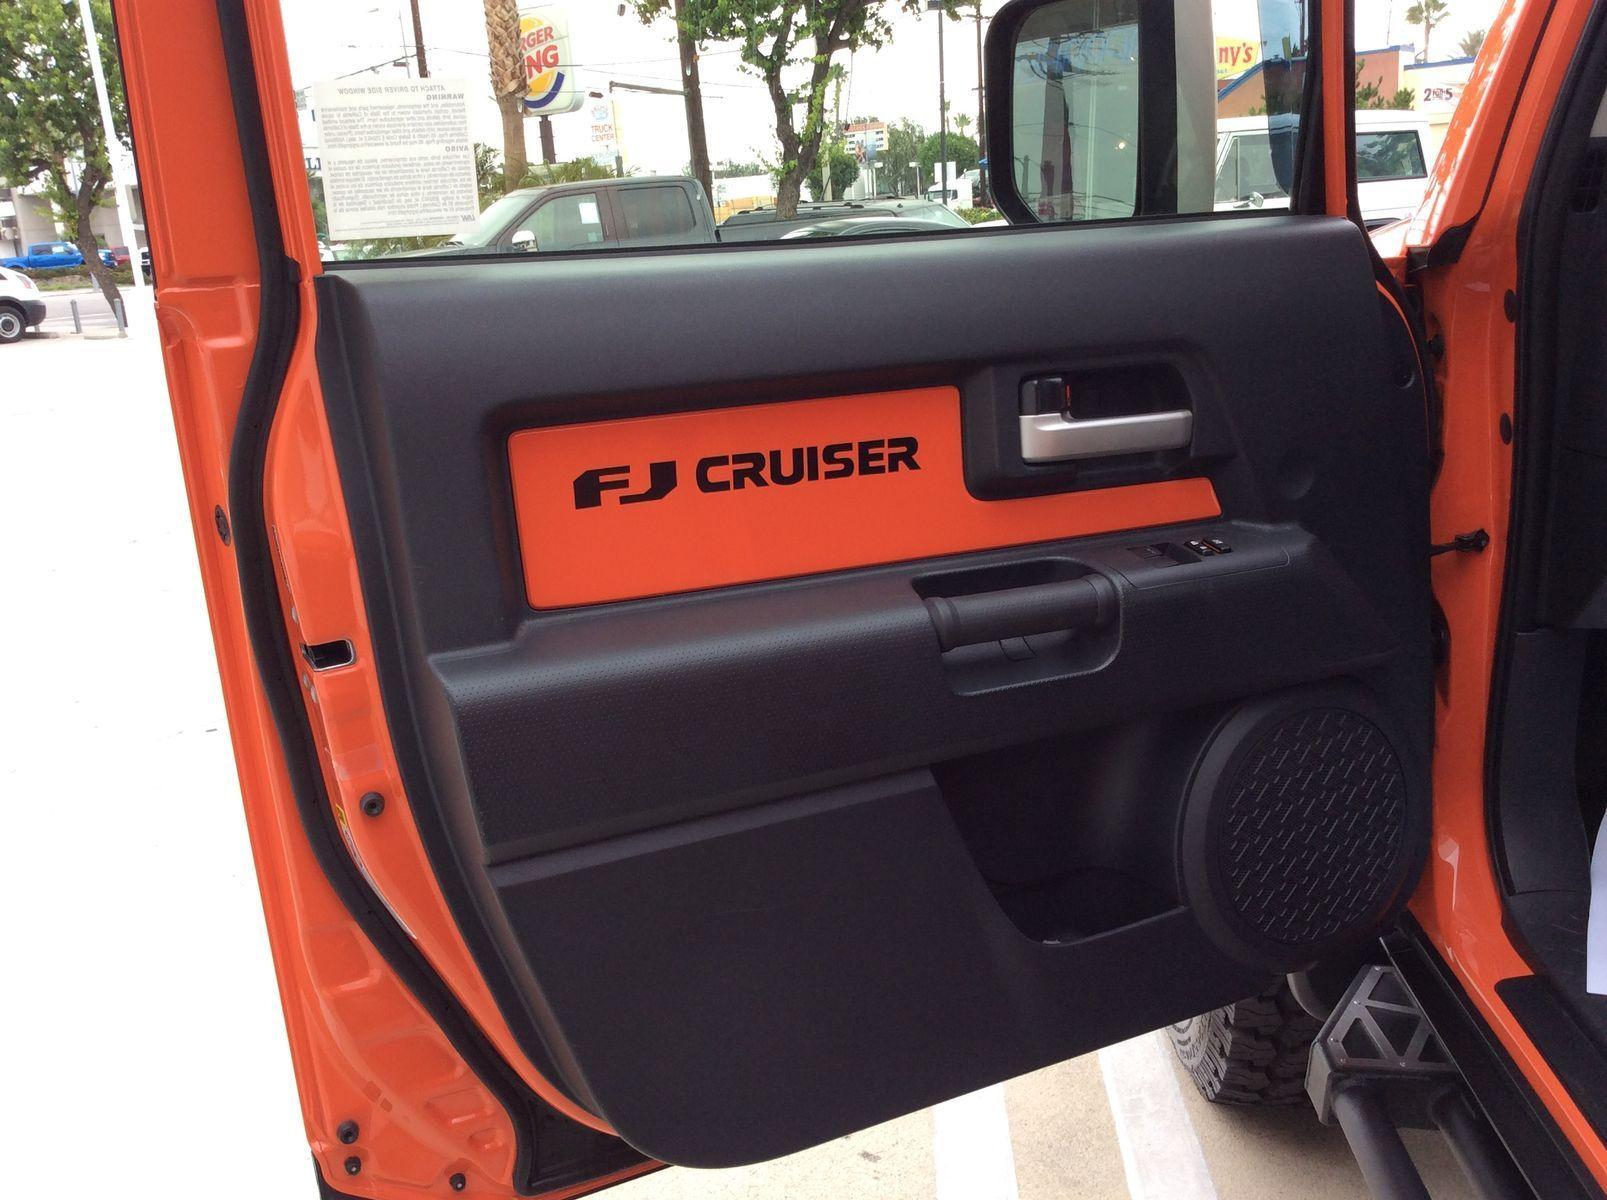 2014 Toyota FJ Cruiser | 2014 FJ Cruiser